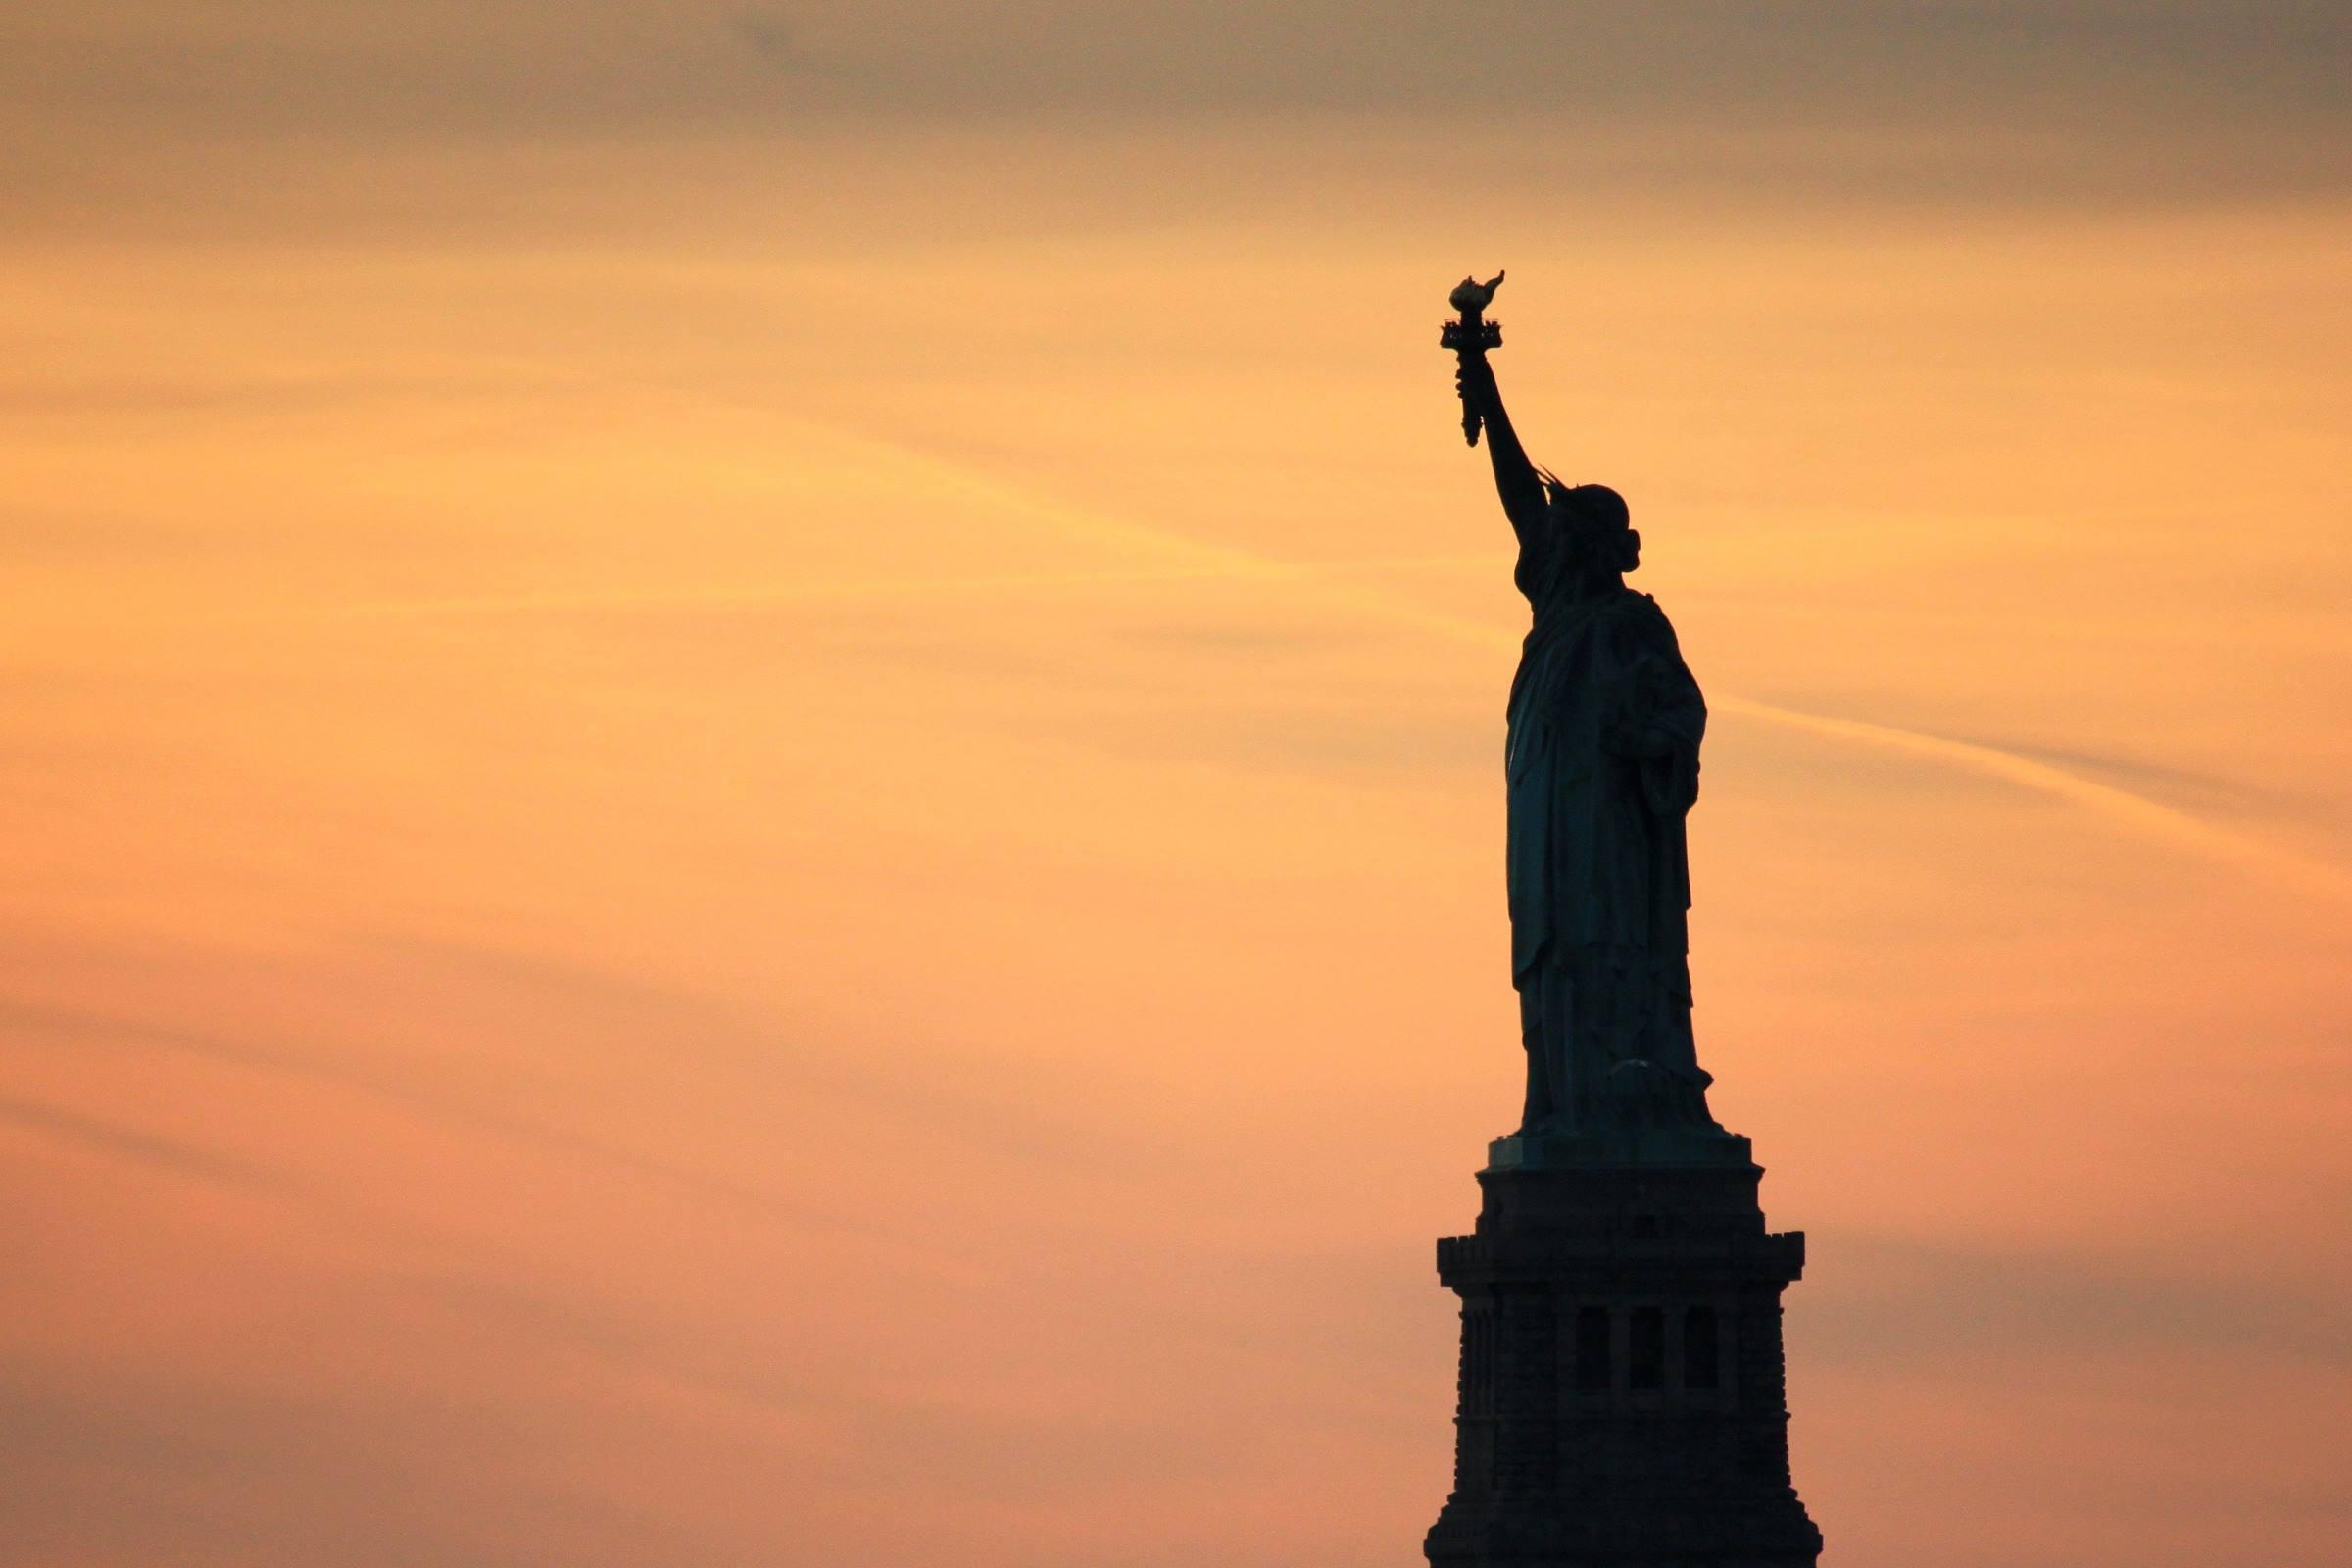 statue of liberty new york sunset silhouette